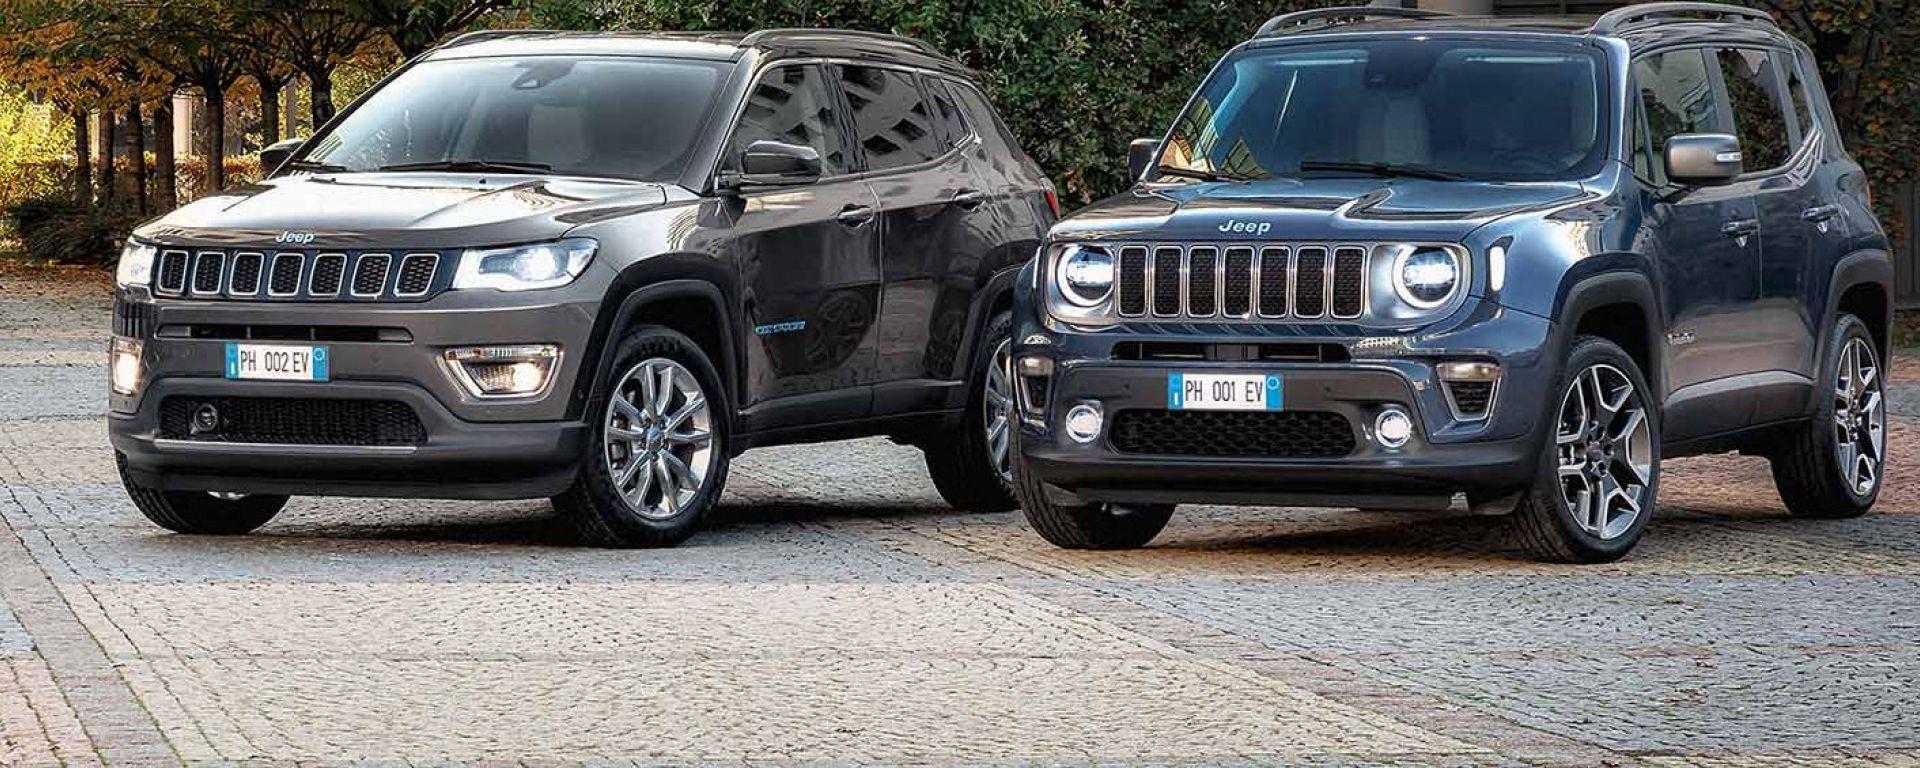 Jeep Renegade e Compass 4xe, al via le vendite (online)